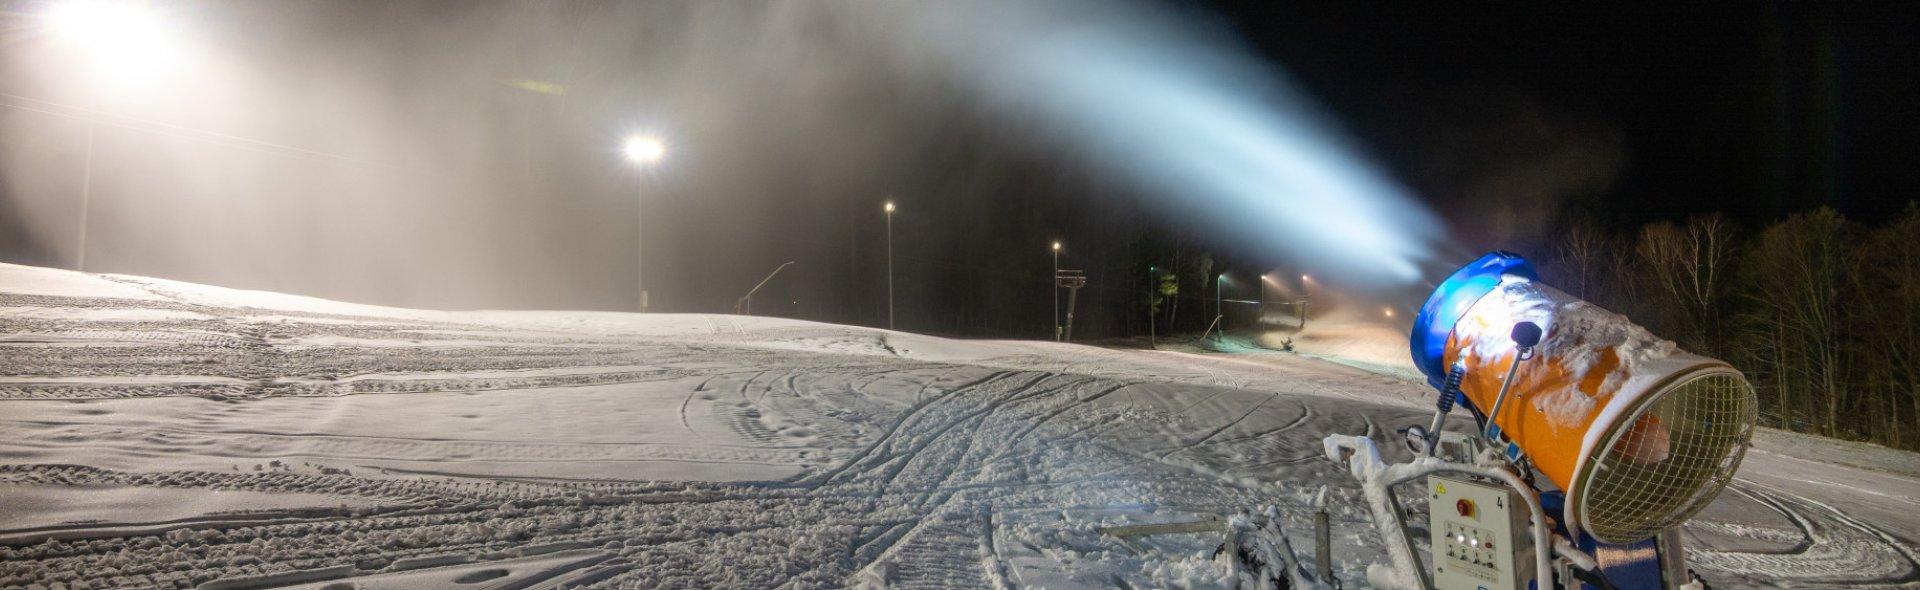 Komunikat narciarski